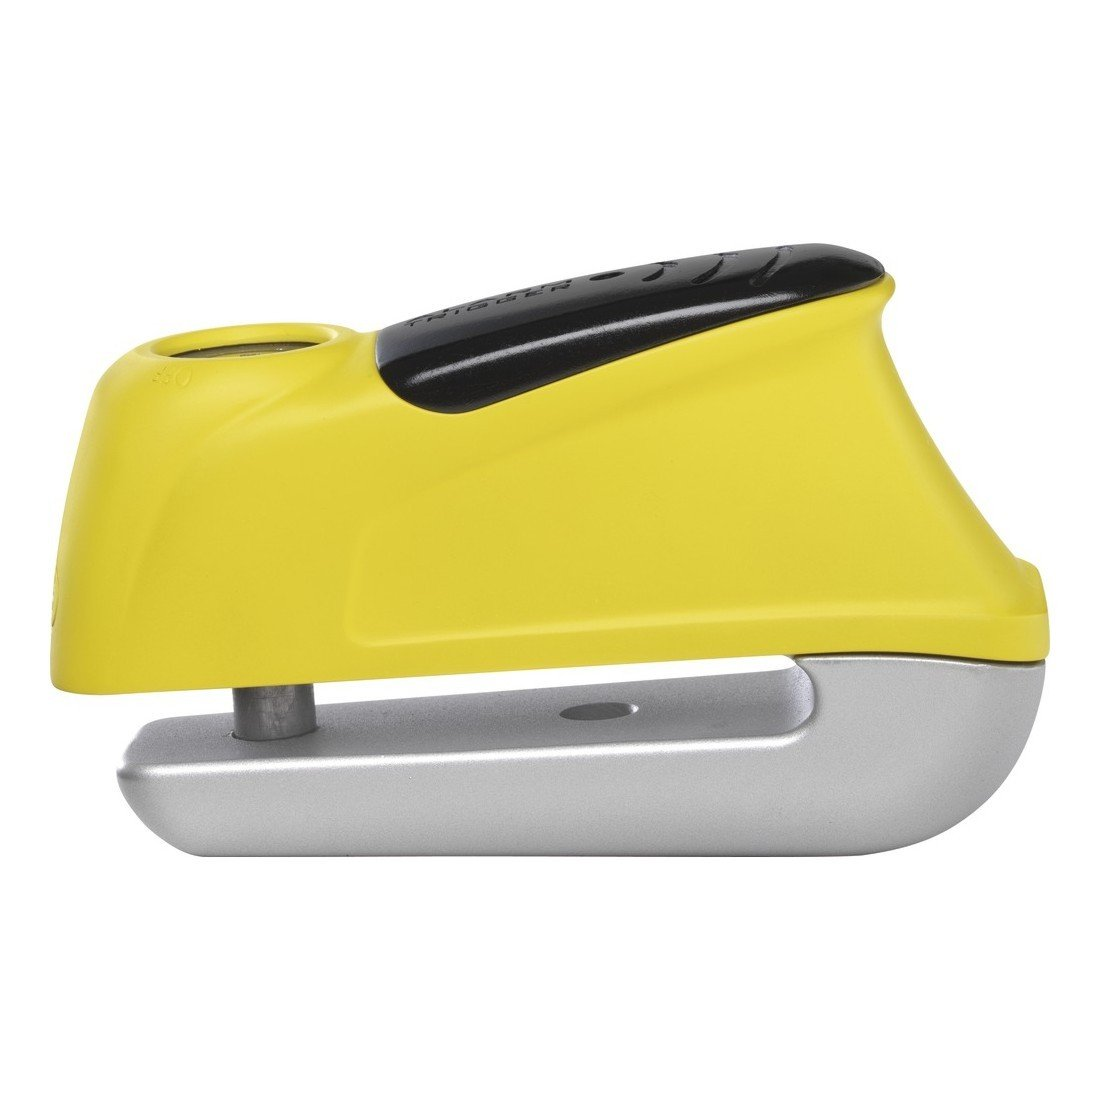 Abus Trigger Alarm 350 Yellow